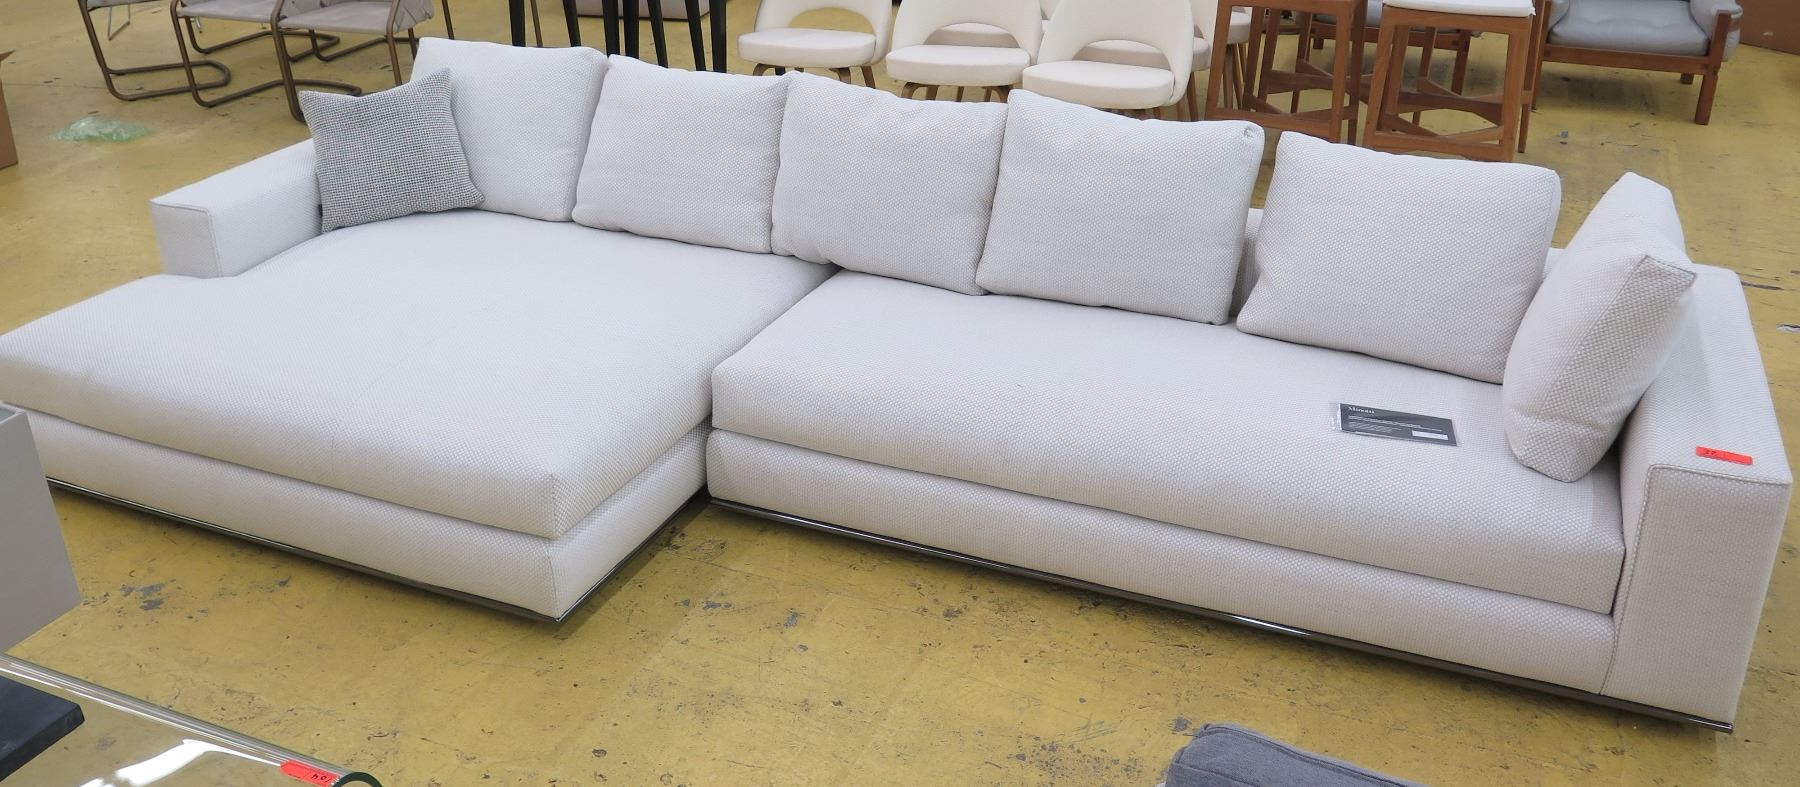 Surprising White Beige Woven Minotti Sectional Sofa 2 Sections 143 Machost Co Dining Chair Design Ideas Machostcouk